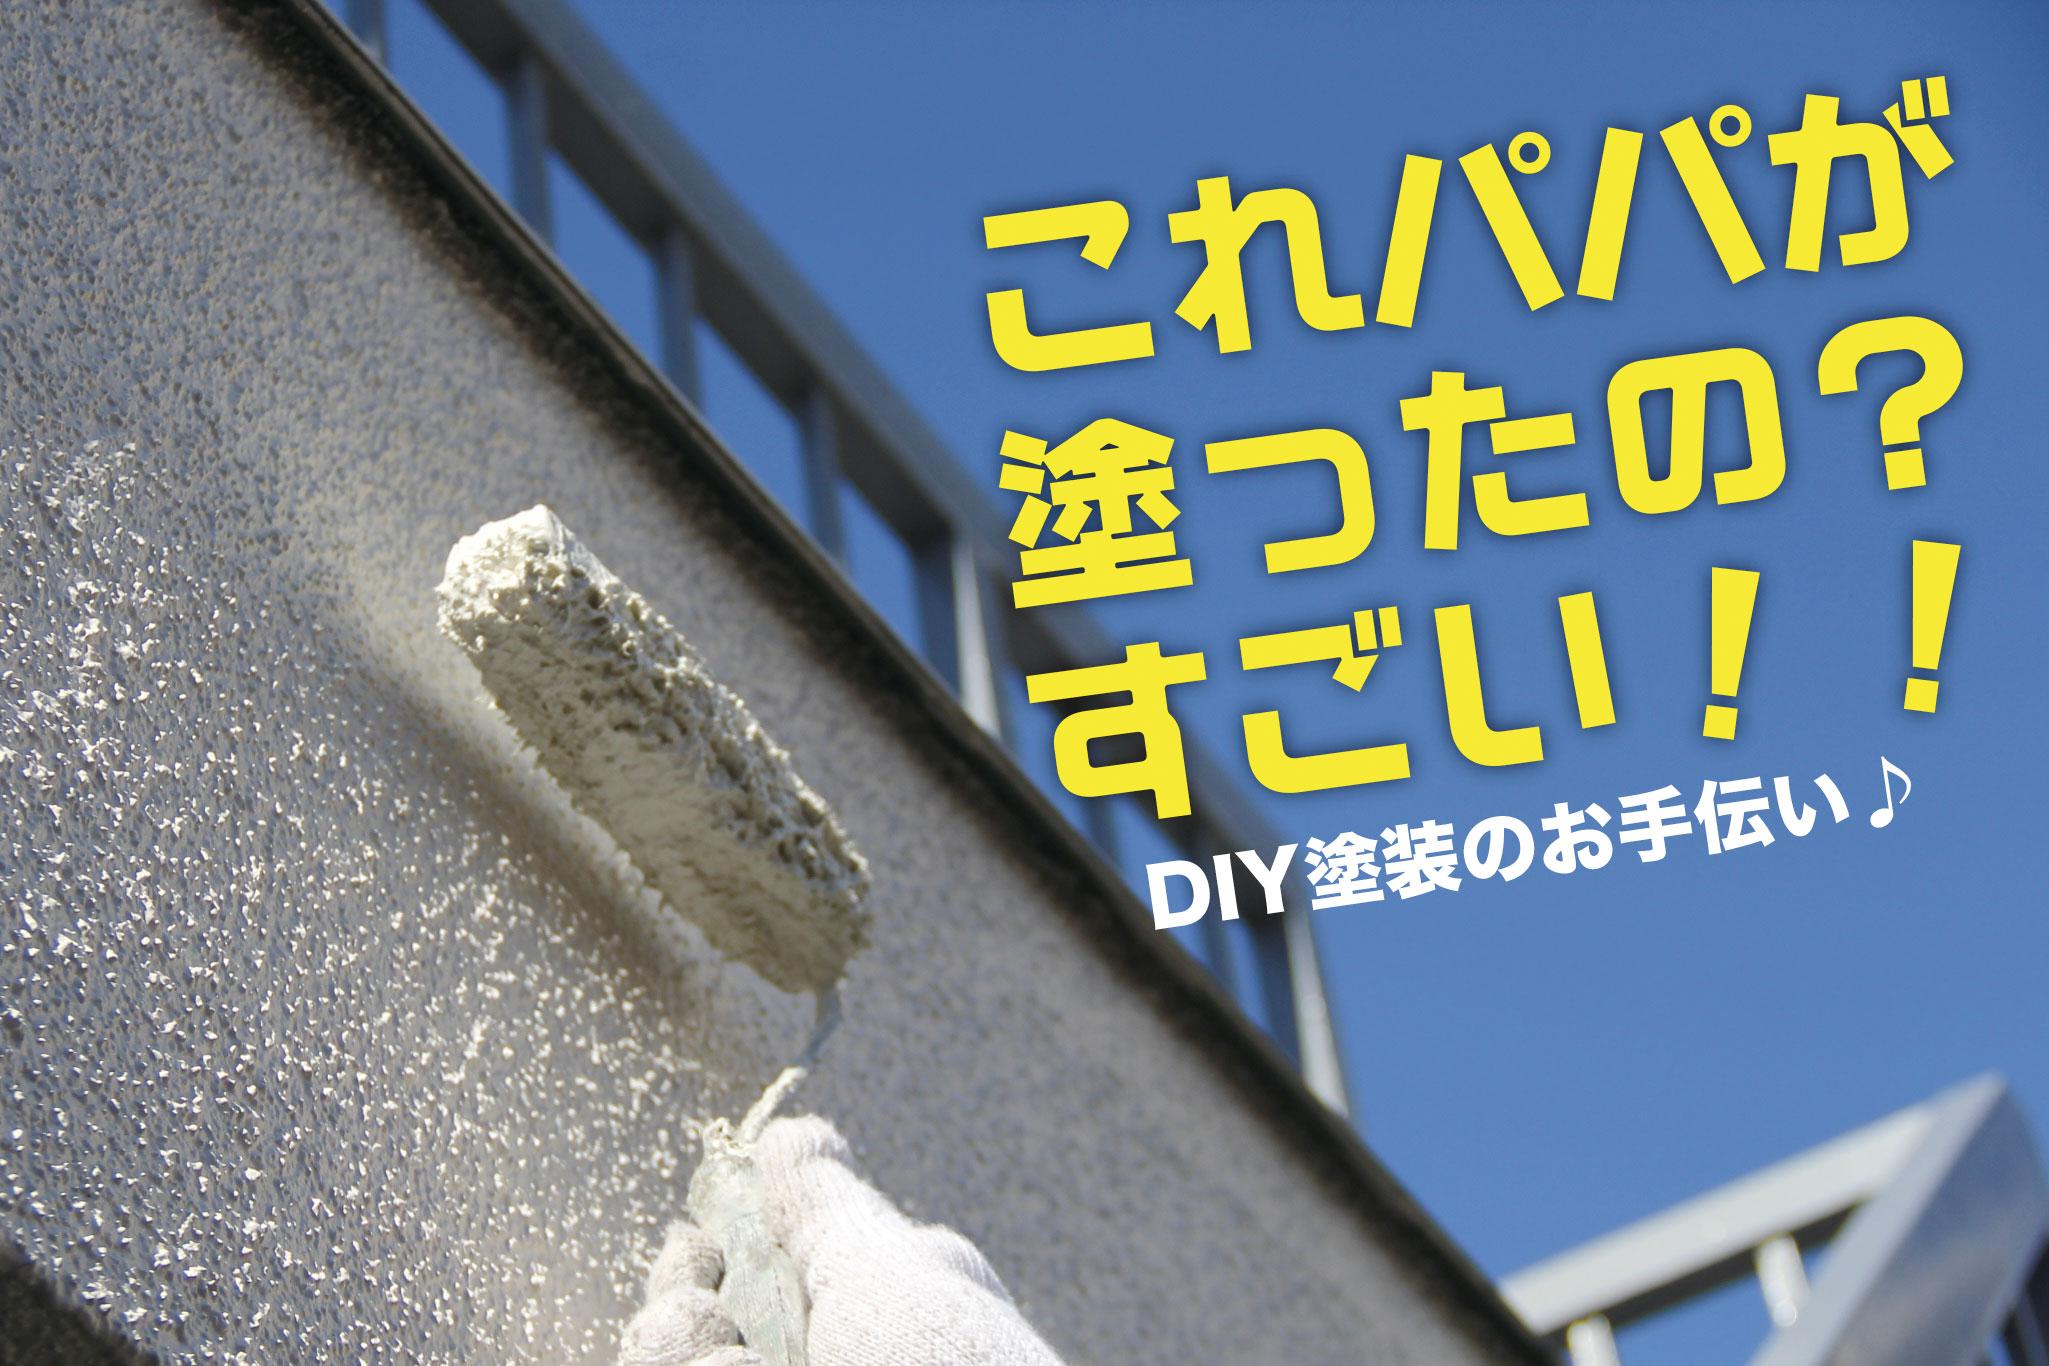 DIY塗装・手伝い隊